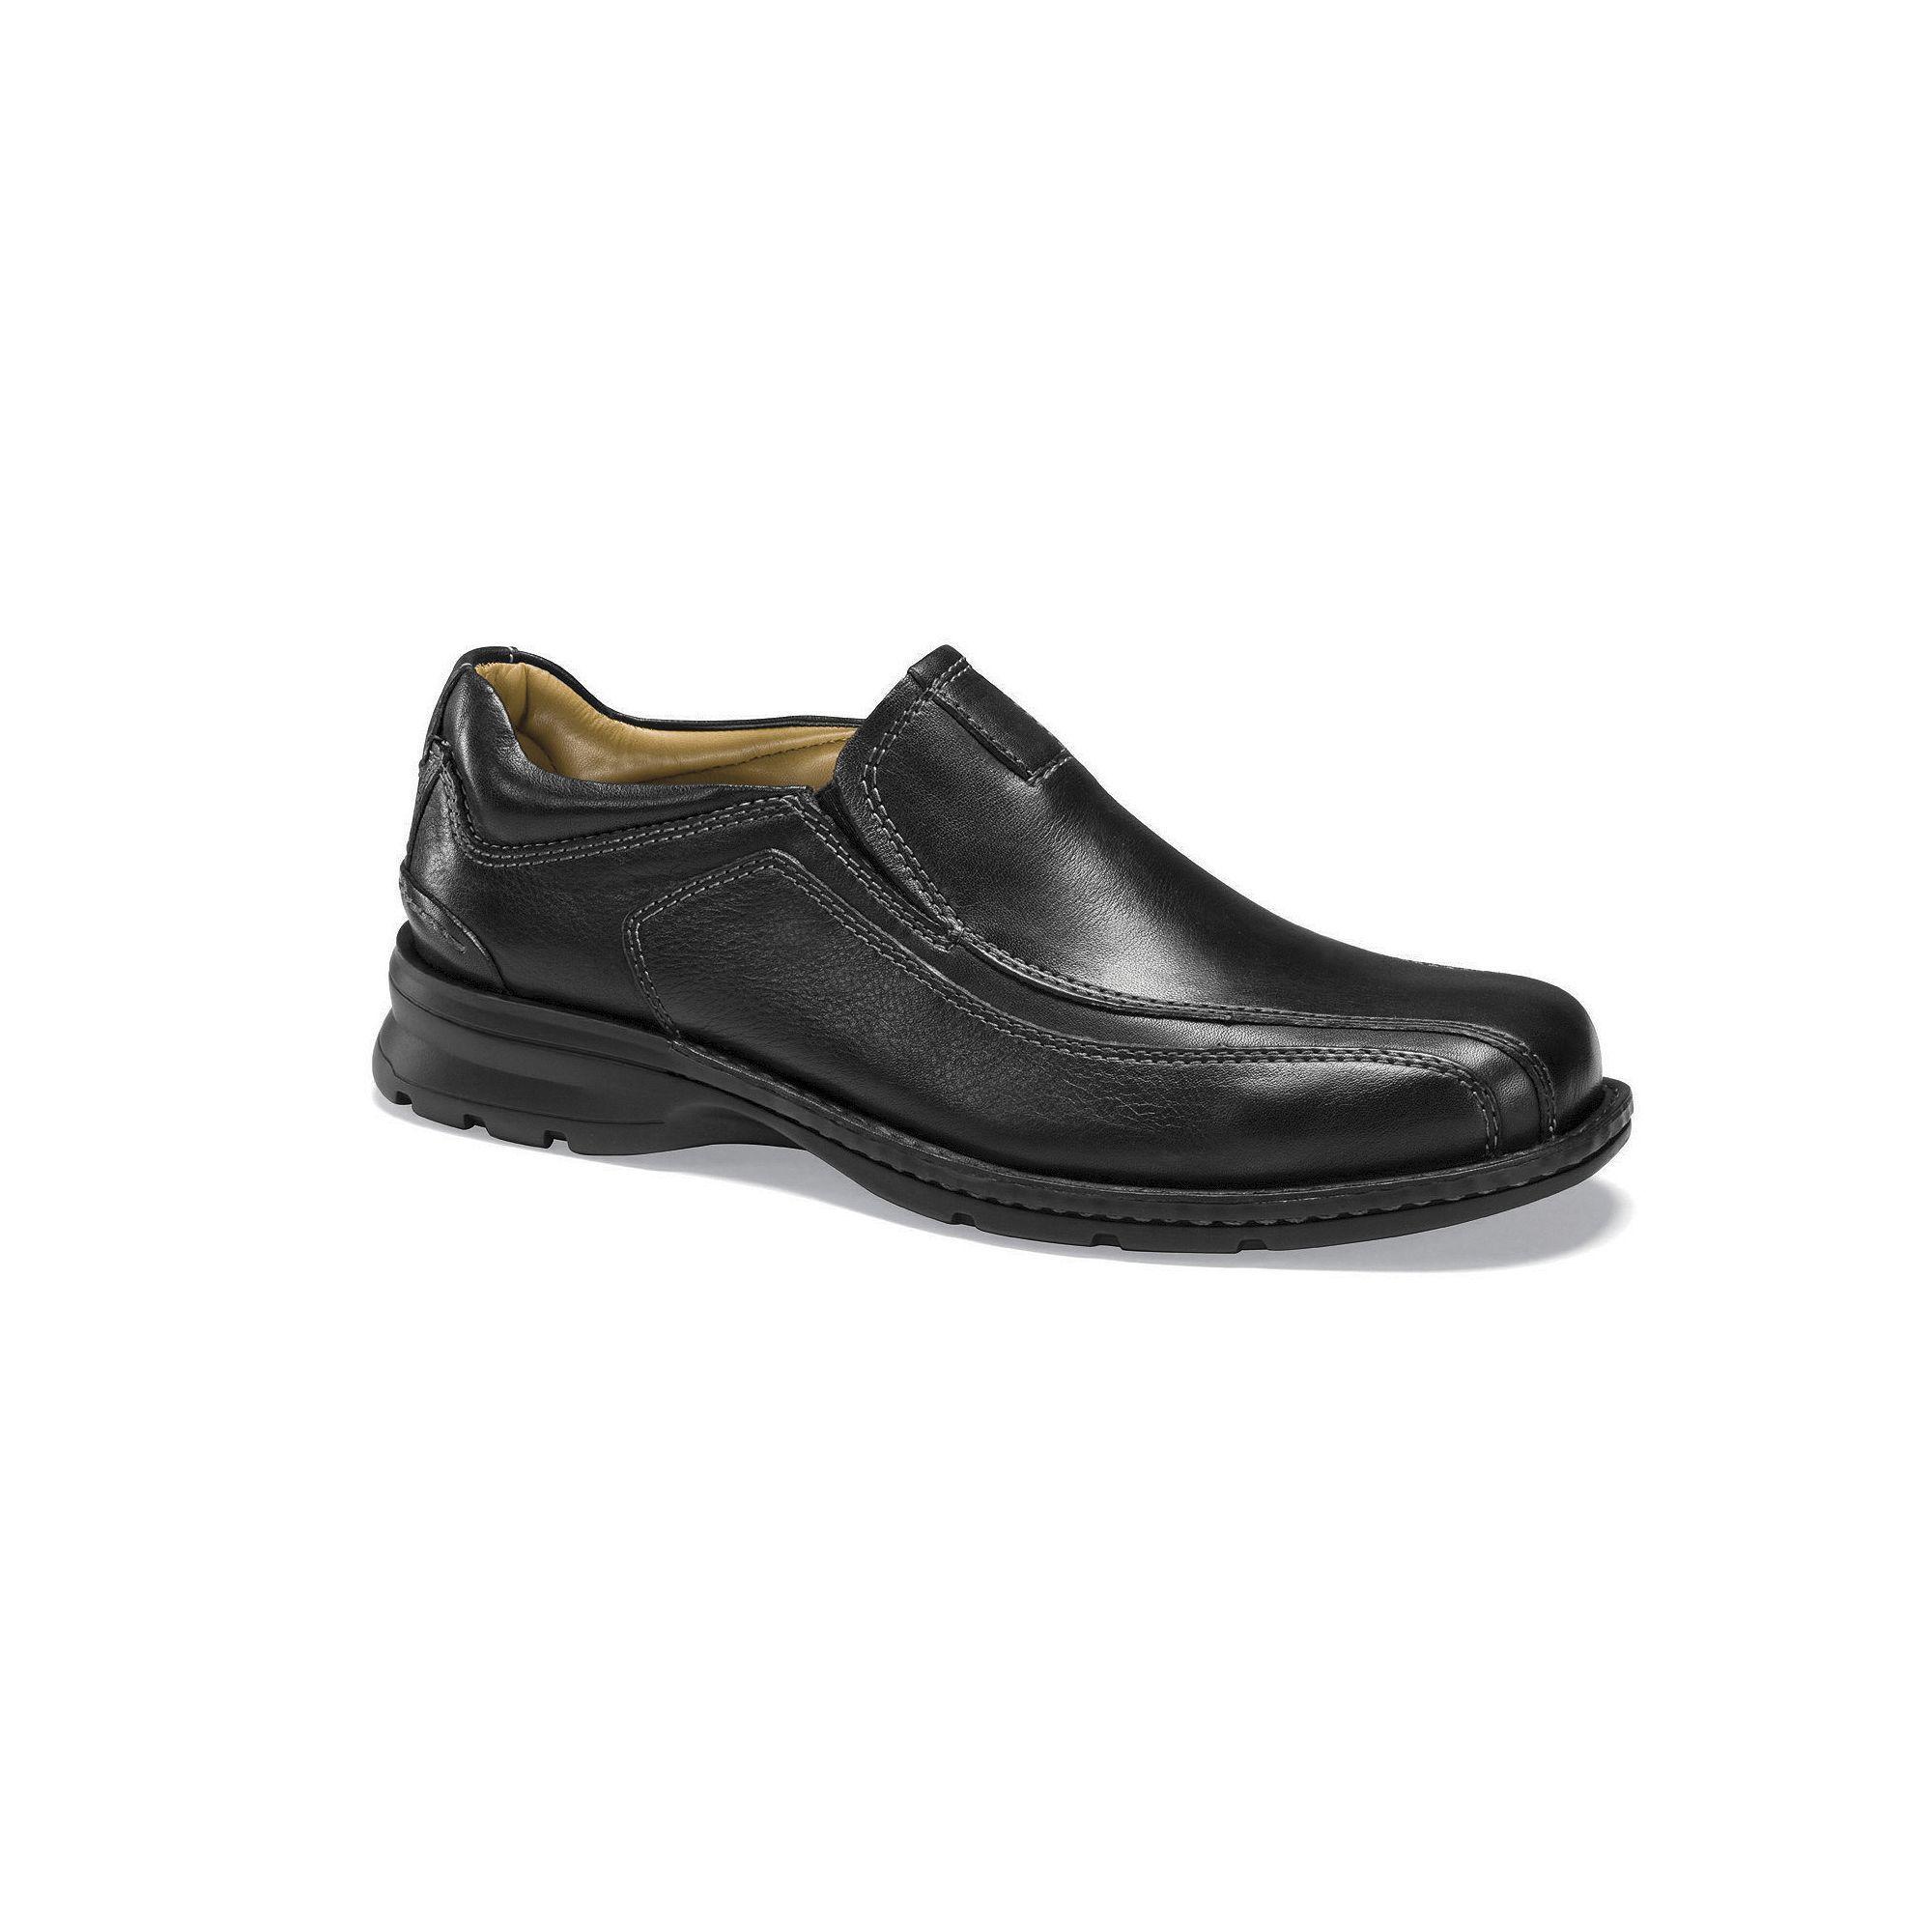 Dockers Agent Men's Leather Casual SlipOn Shoes, Size